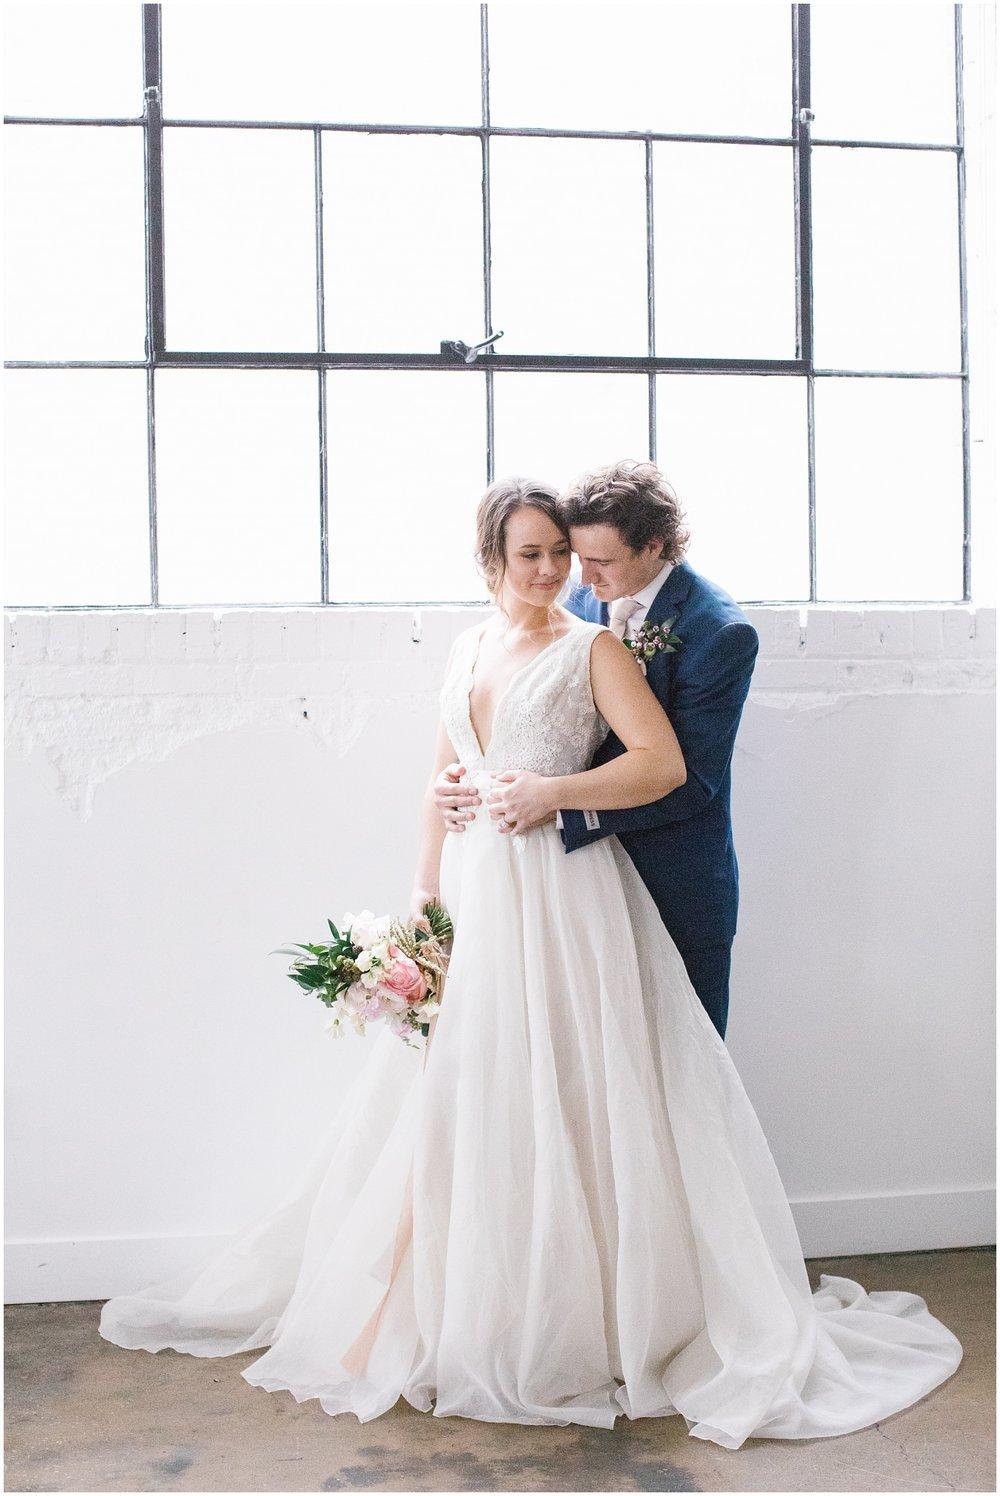 Styled Shoot2-17-65_Lizzie-B-Imagery-Utah-Wedding-Photographer-Park-City-Salt-Lake-City-Charcoal-Loft-Studio.jpg